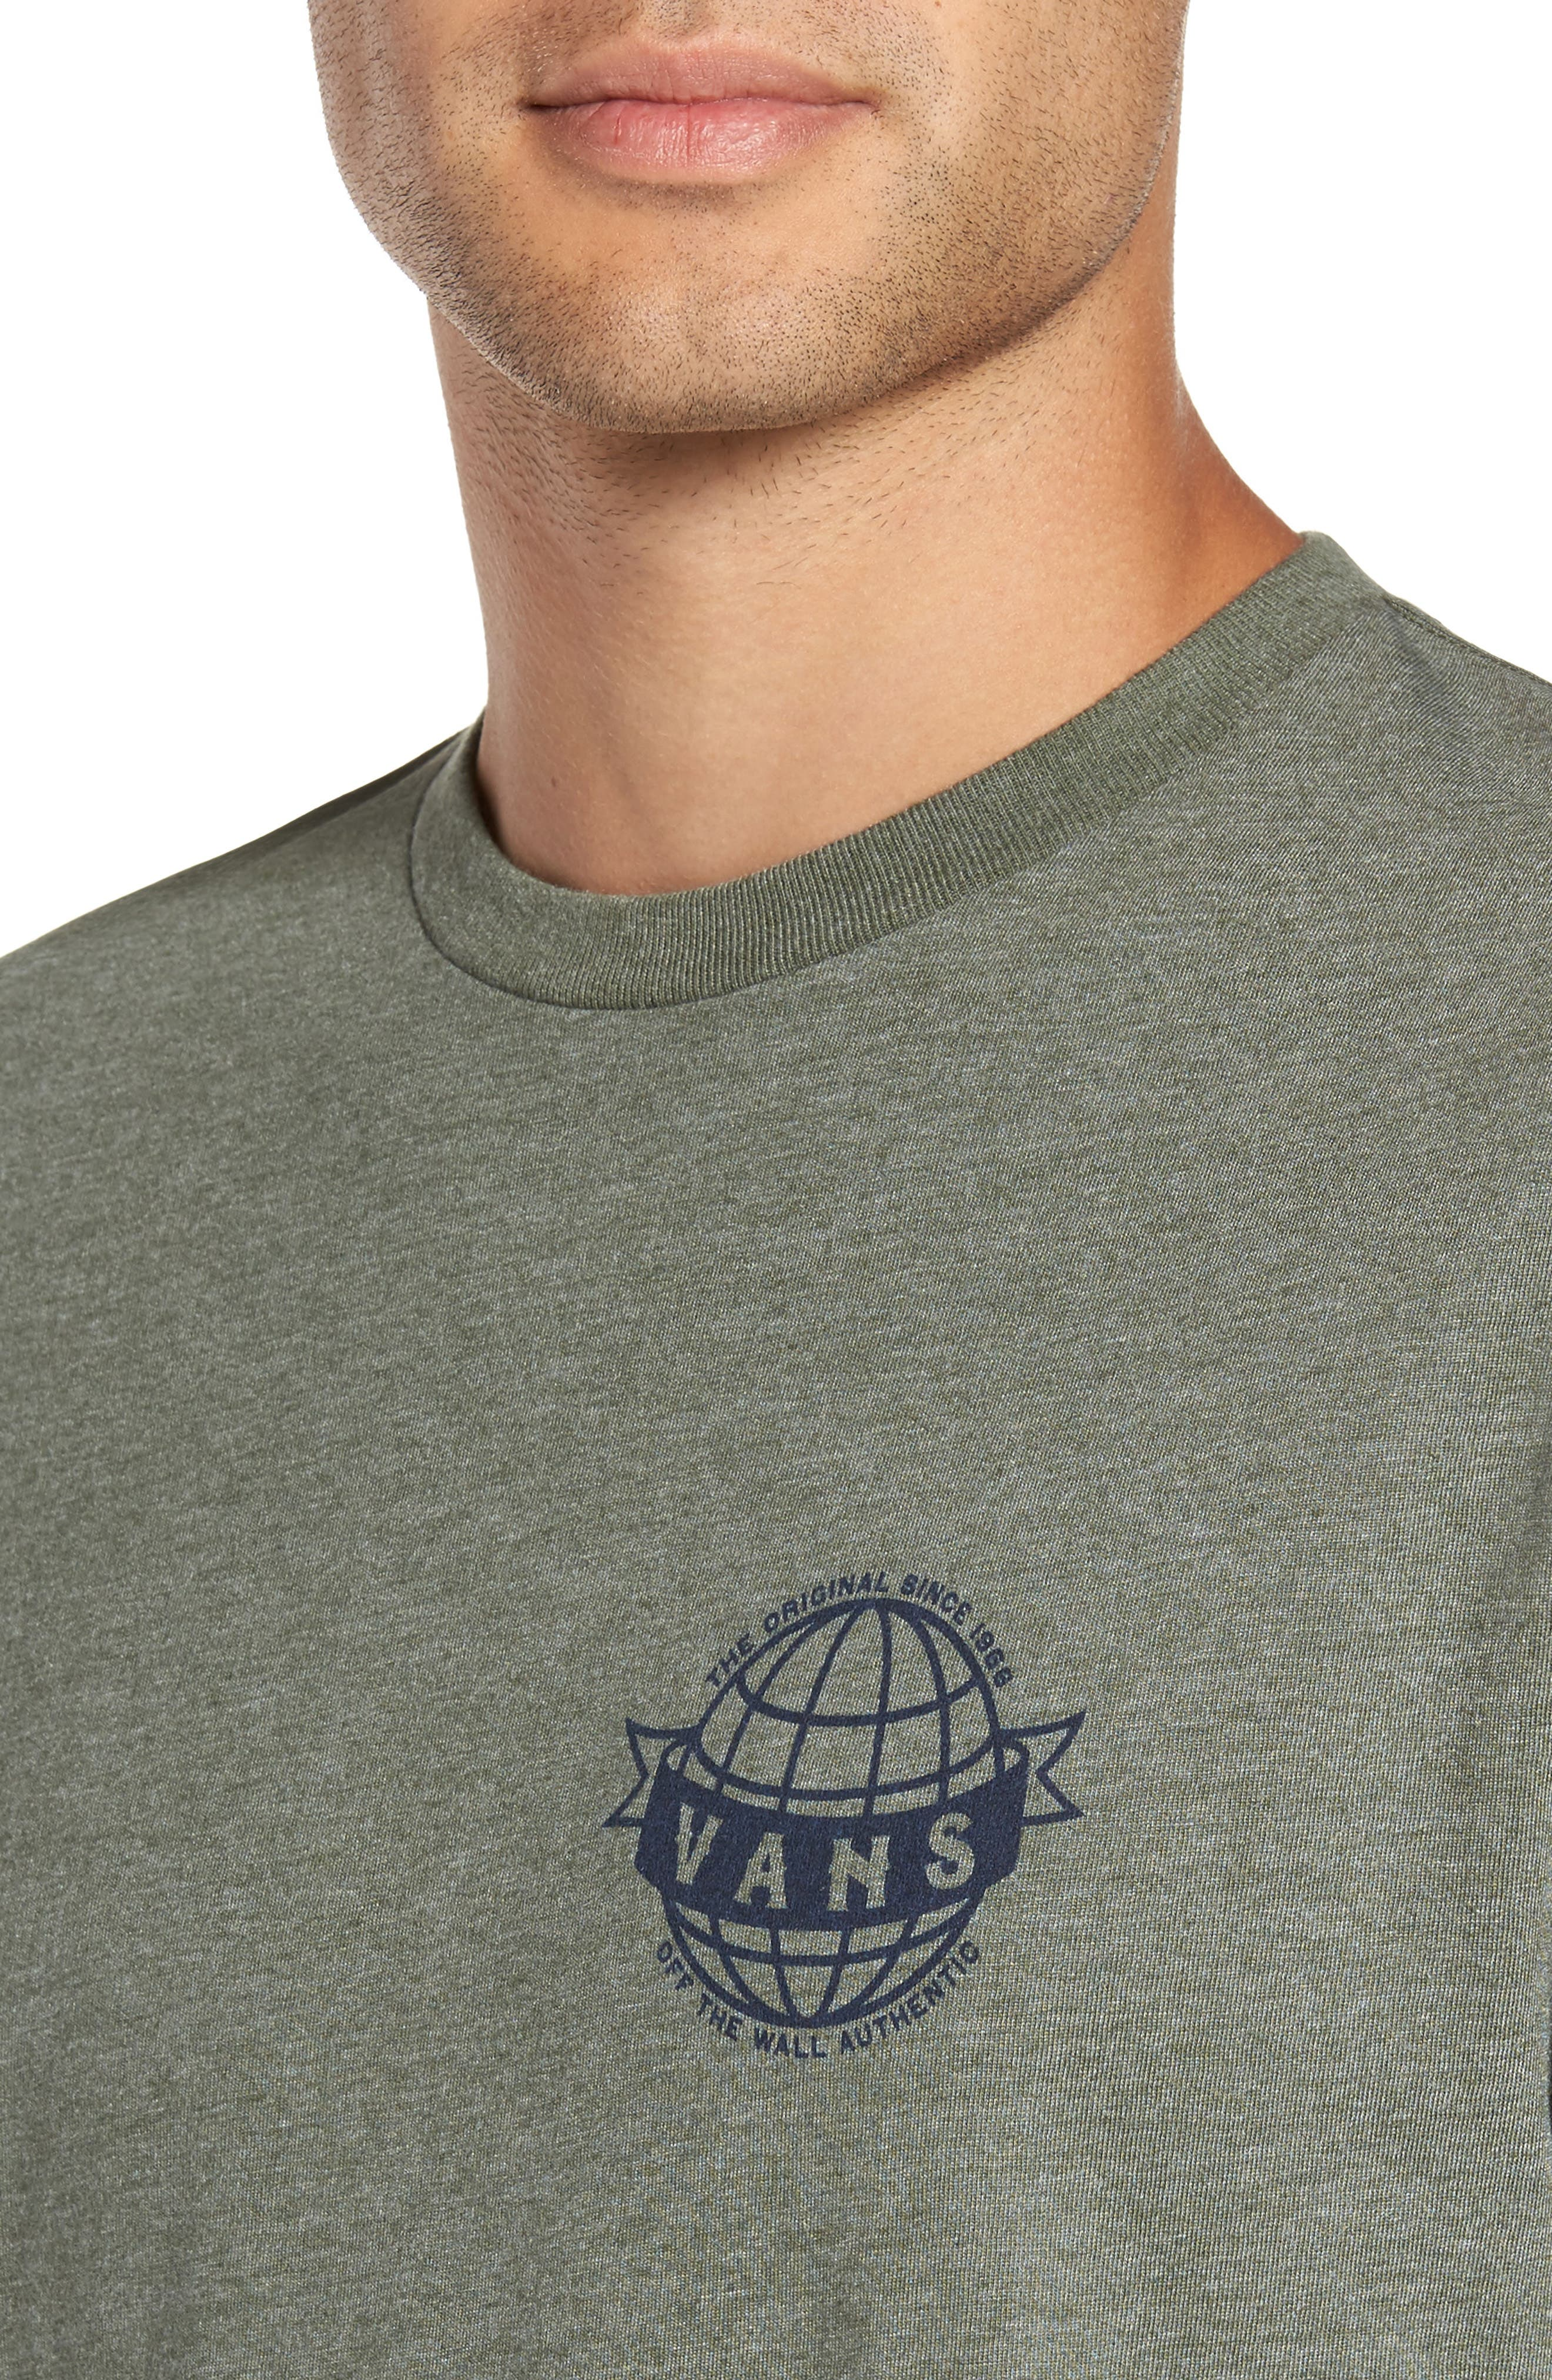 Global Landing Logo Graphic T-Shirt,                             Alternate thumbnail 4, color,                             301